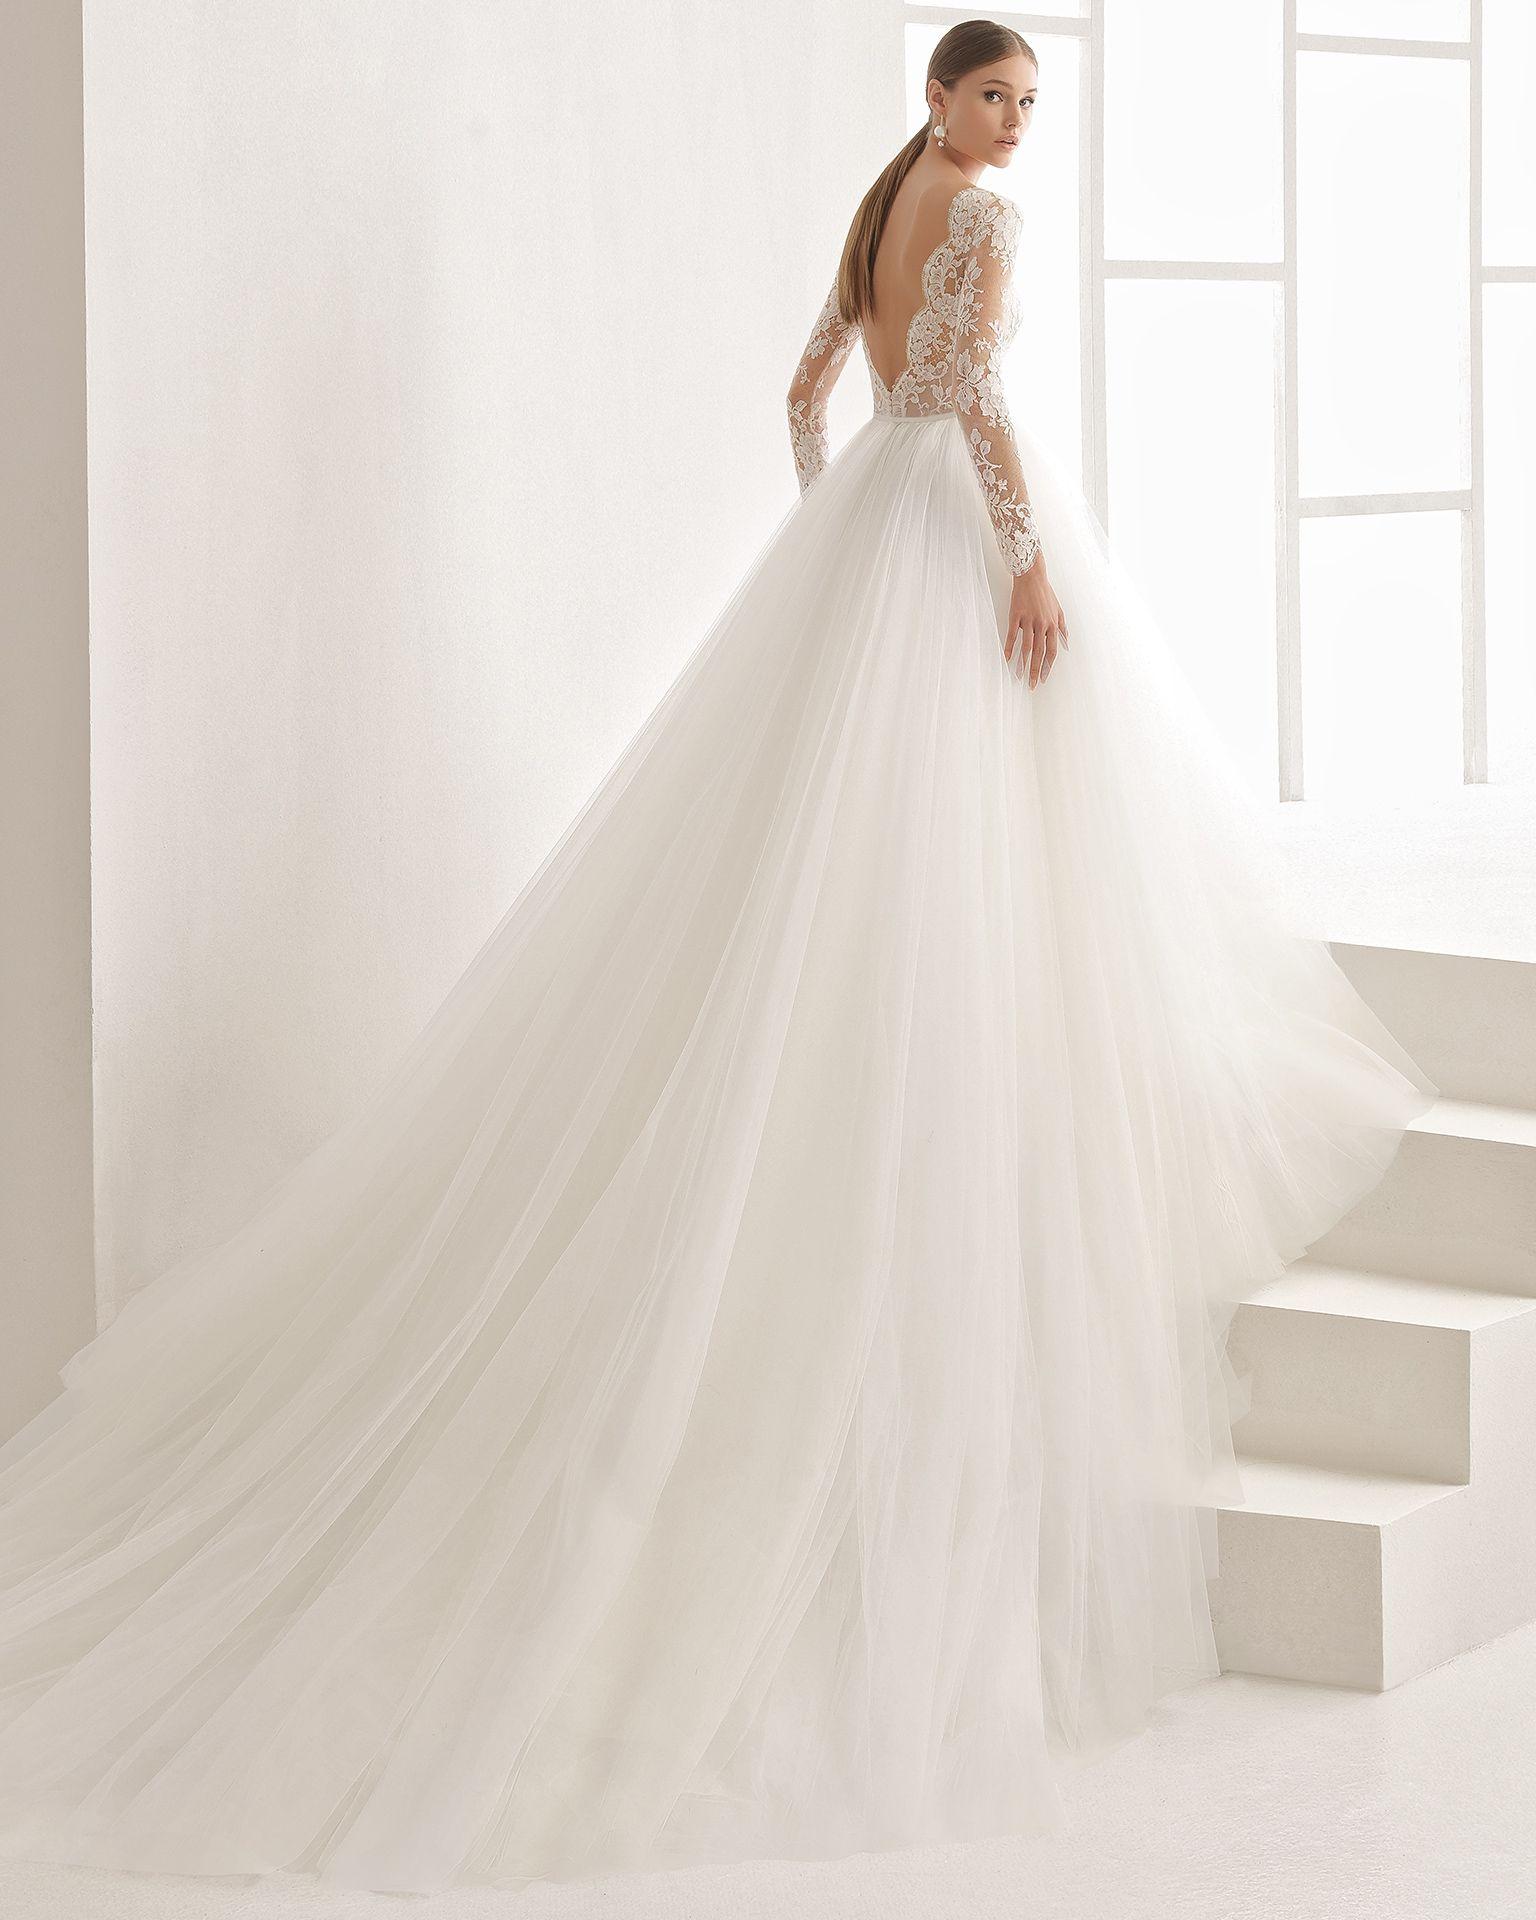 Niher Hochzeit 2017 Rosa Clará Kollektion